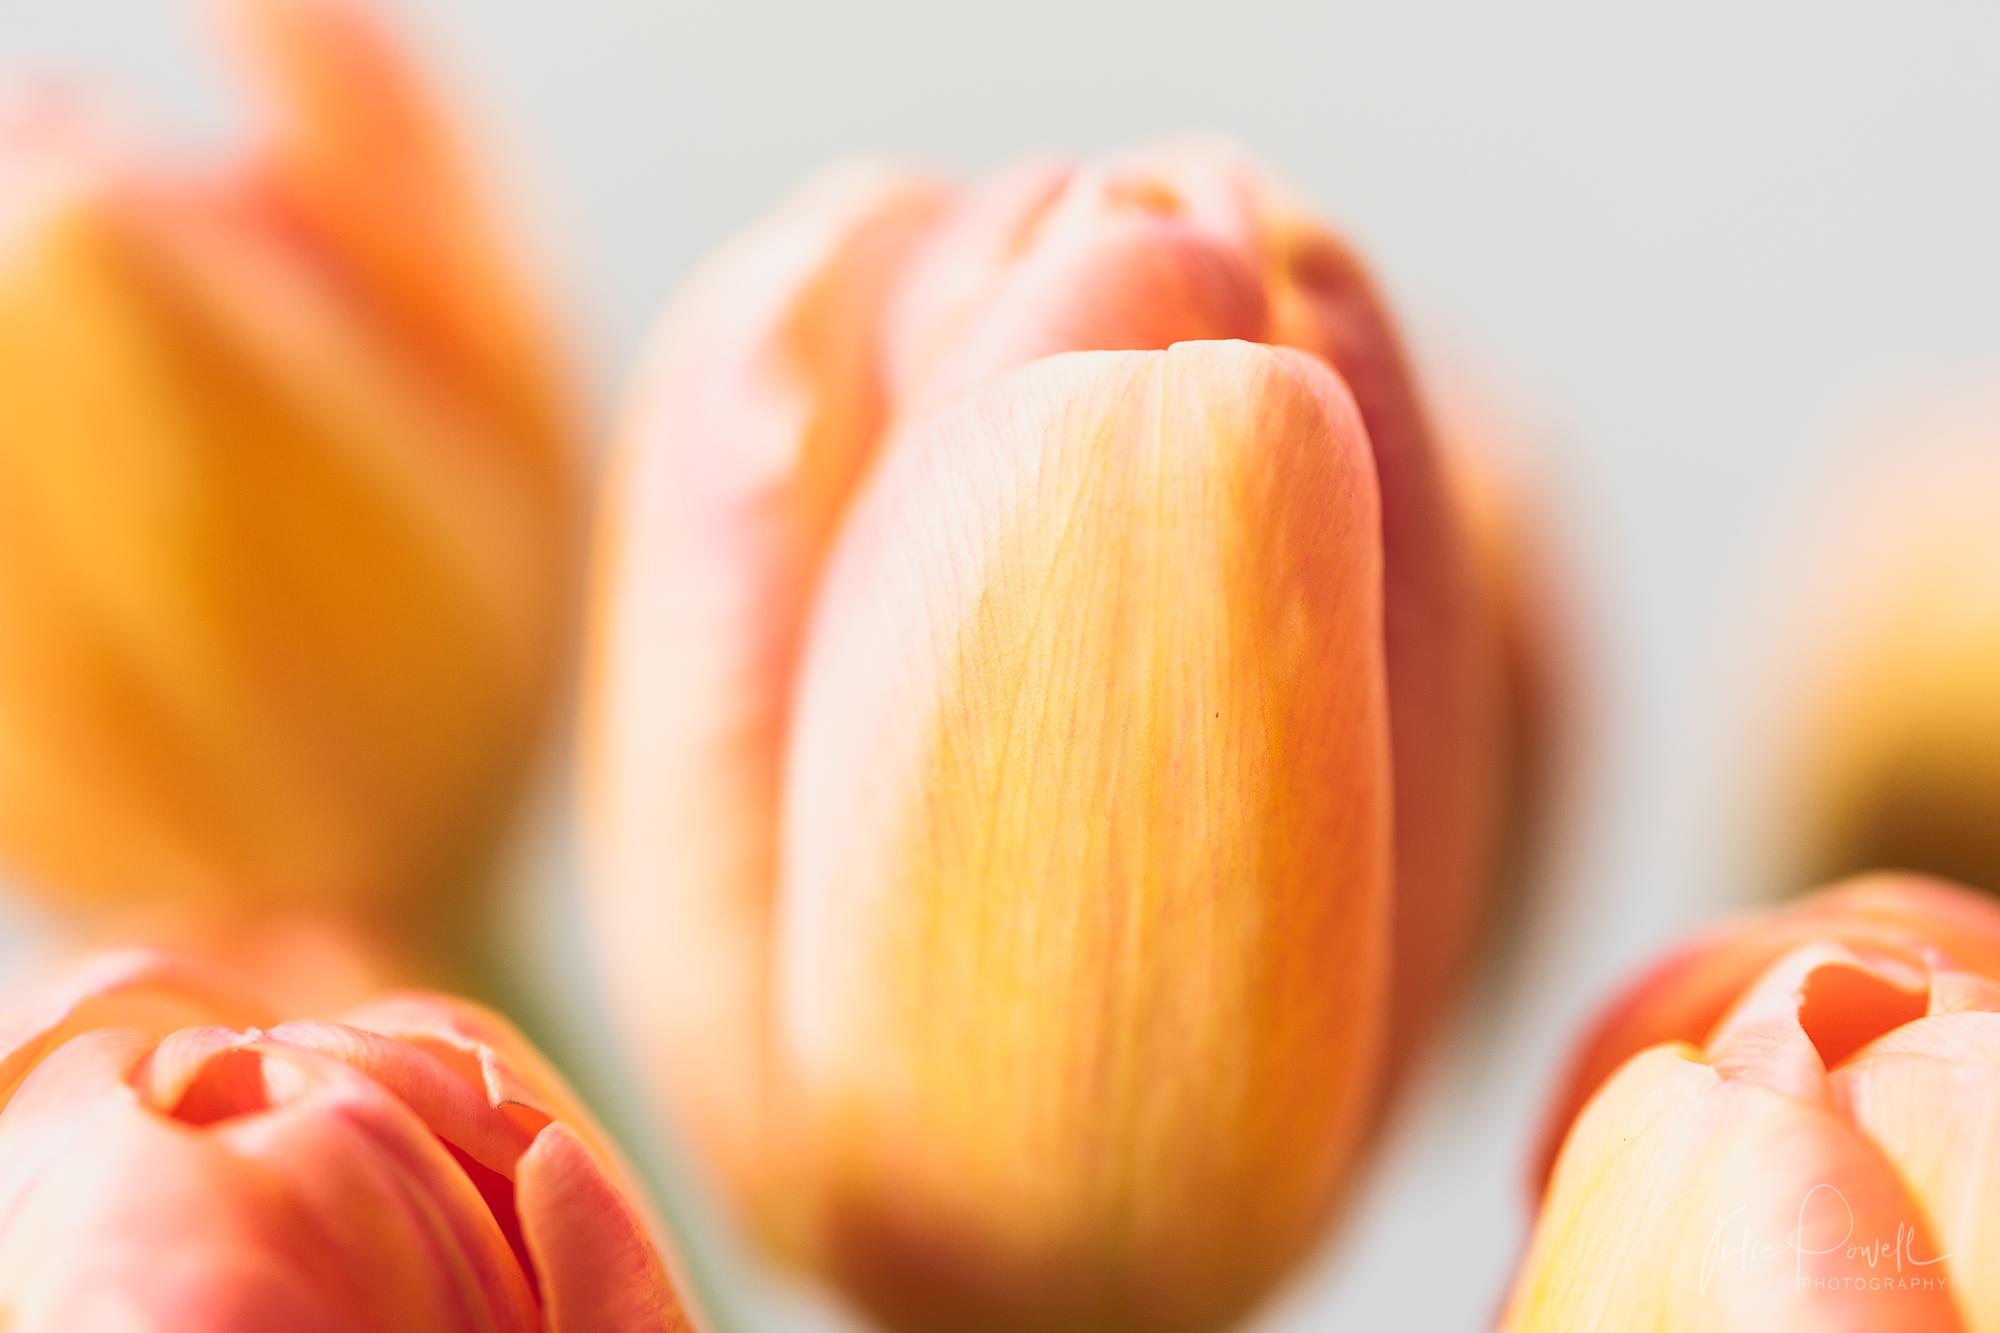 Julie Powell_Tulips-3.jpg